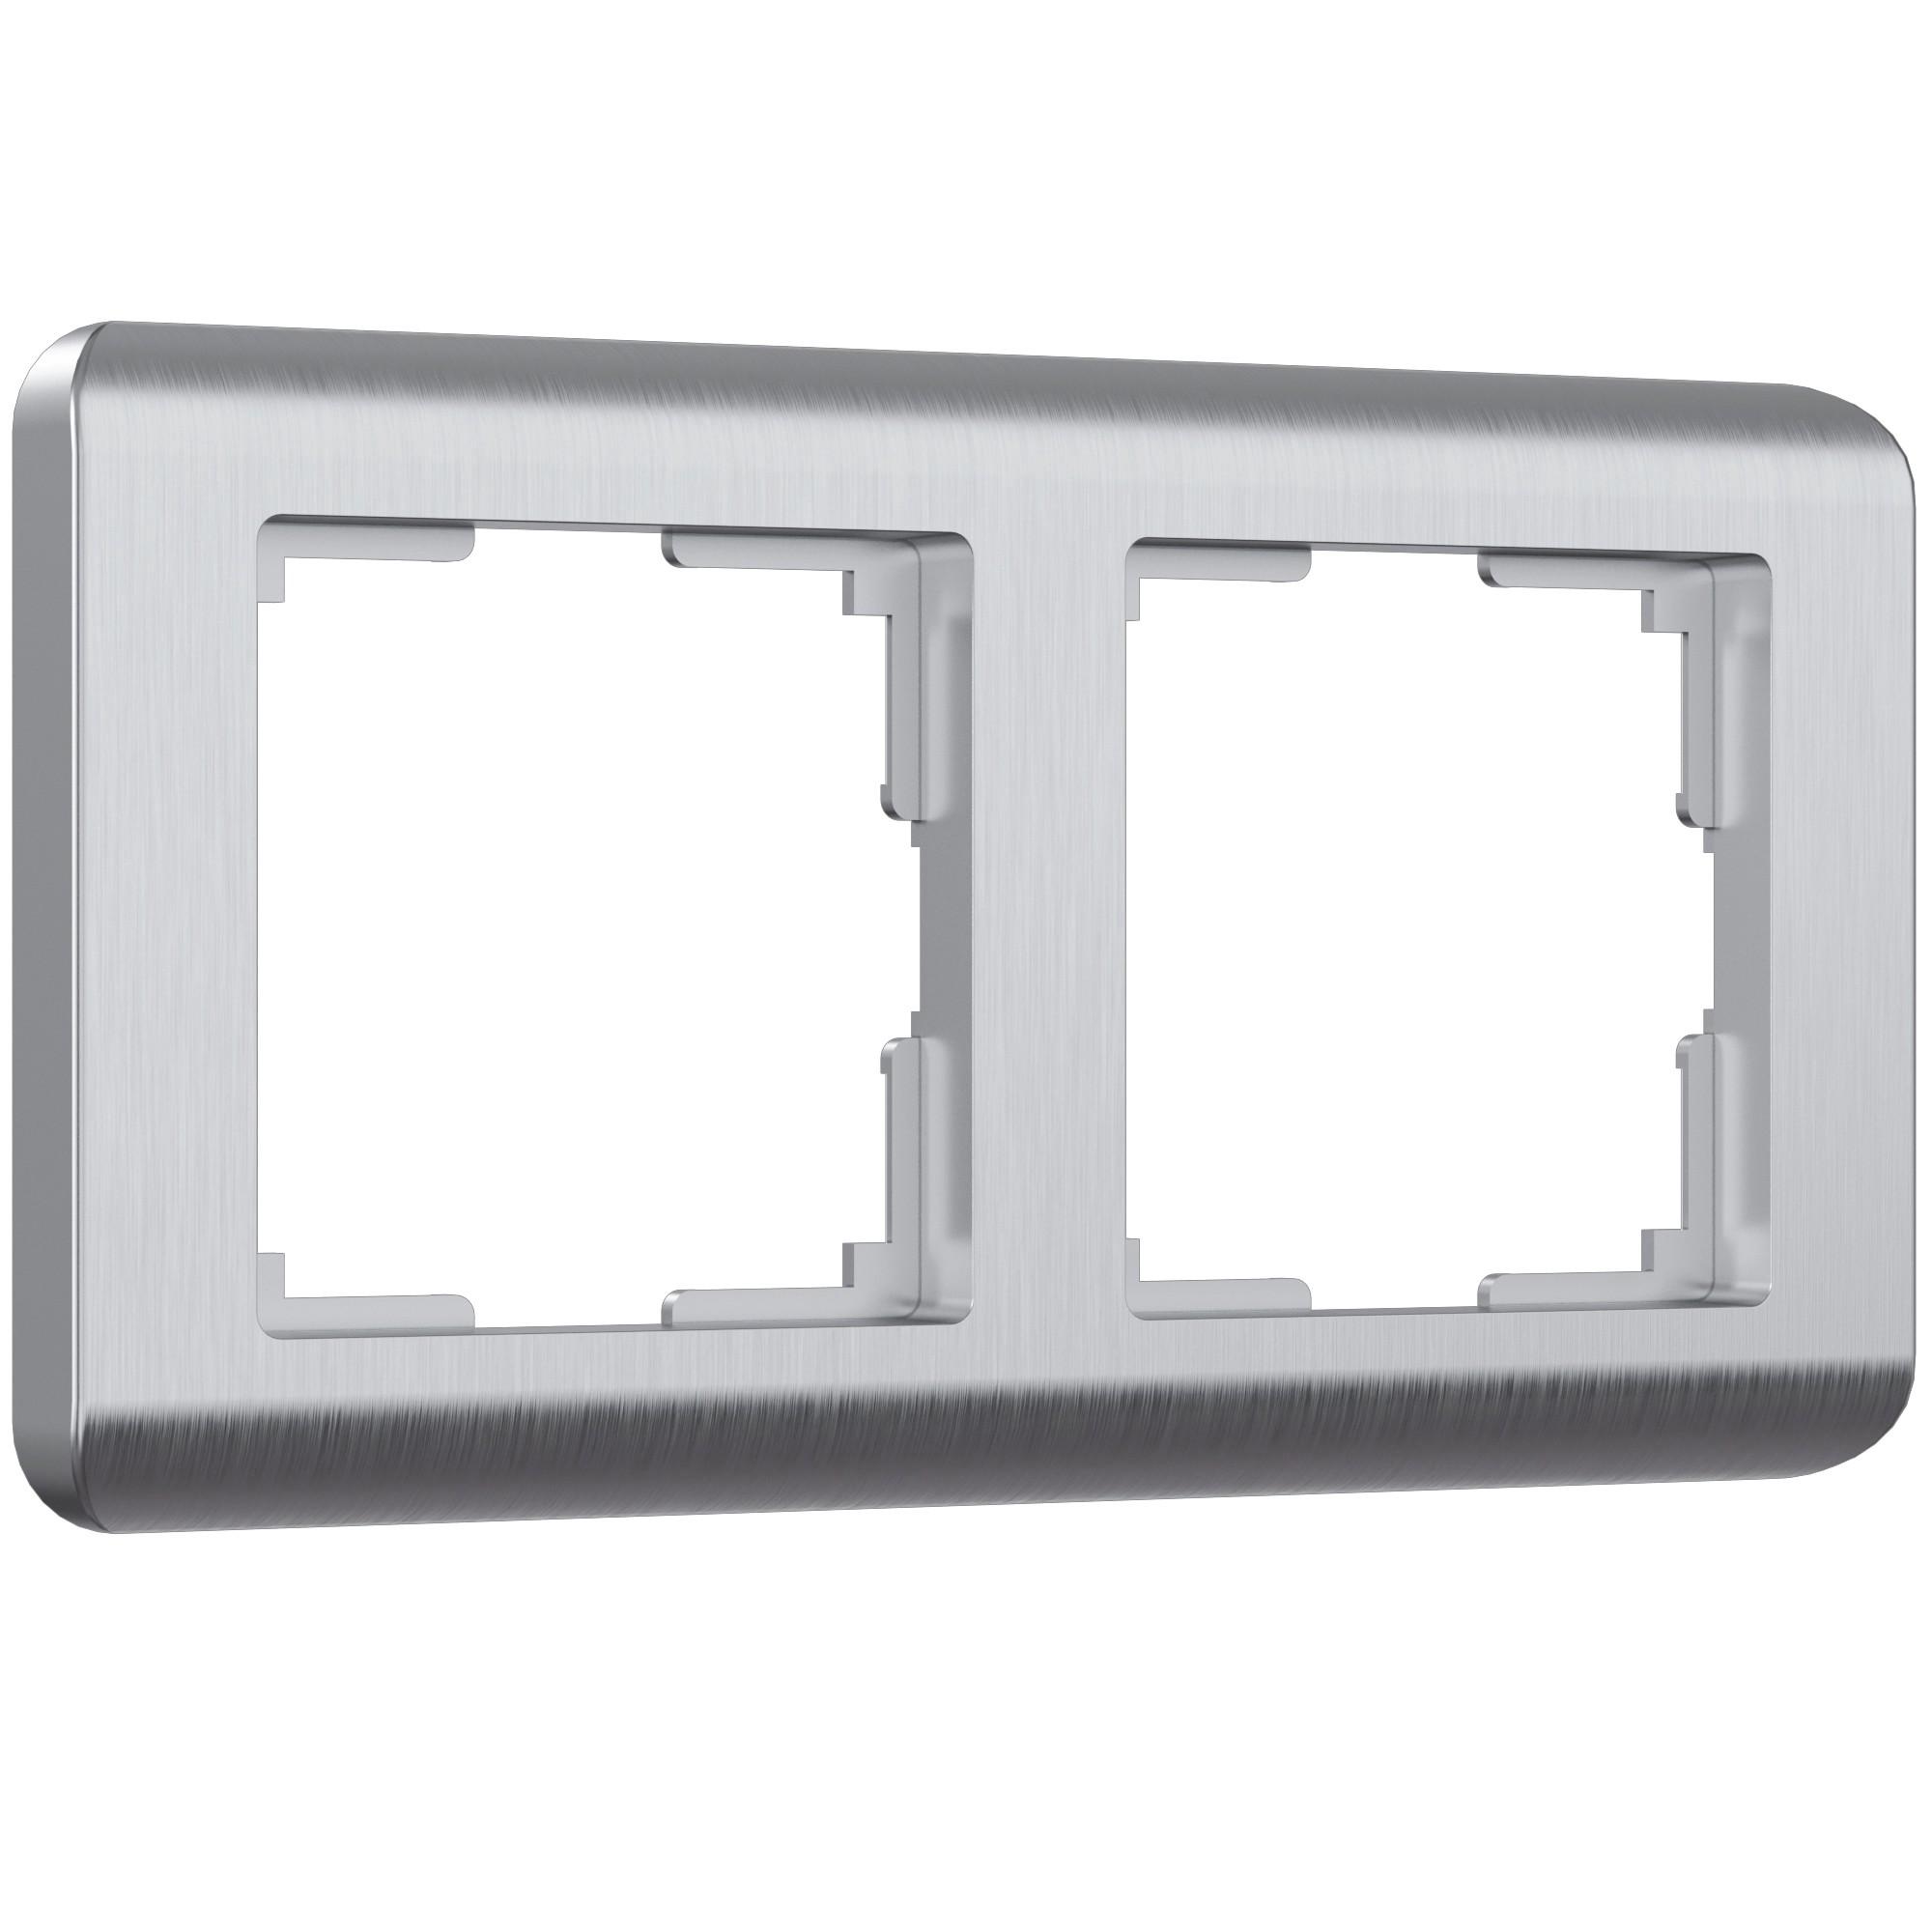 WL12-Frame-02 / Рамка на 2 поста (серебряный)